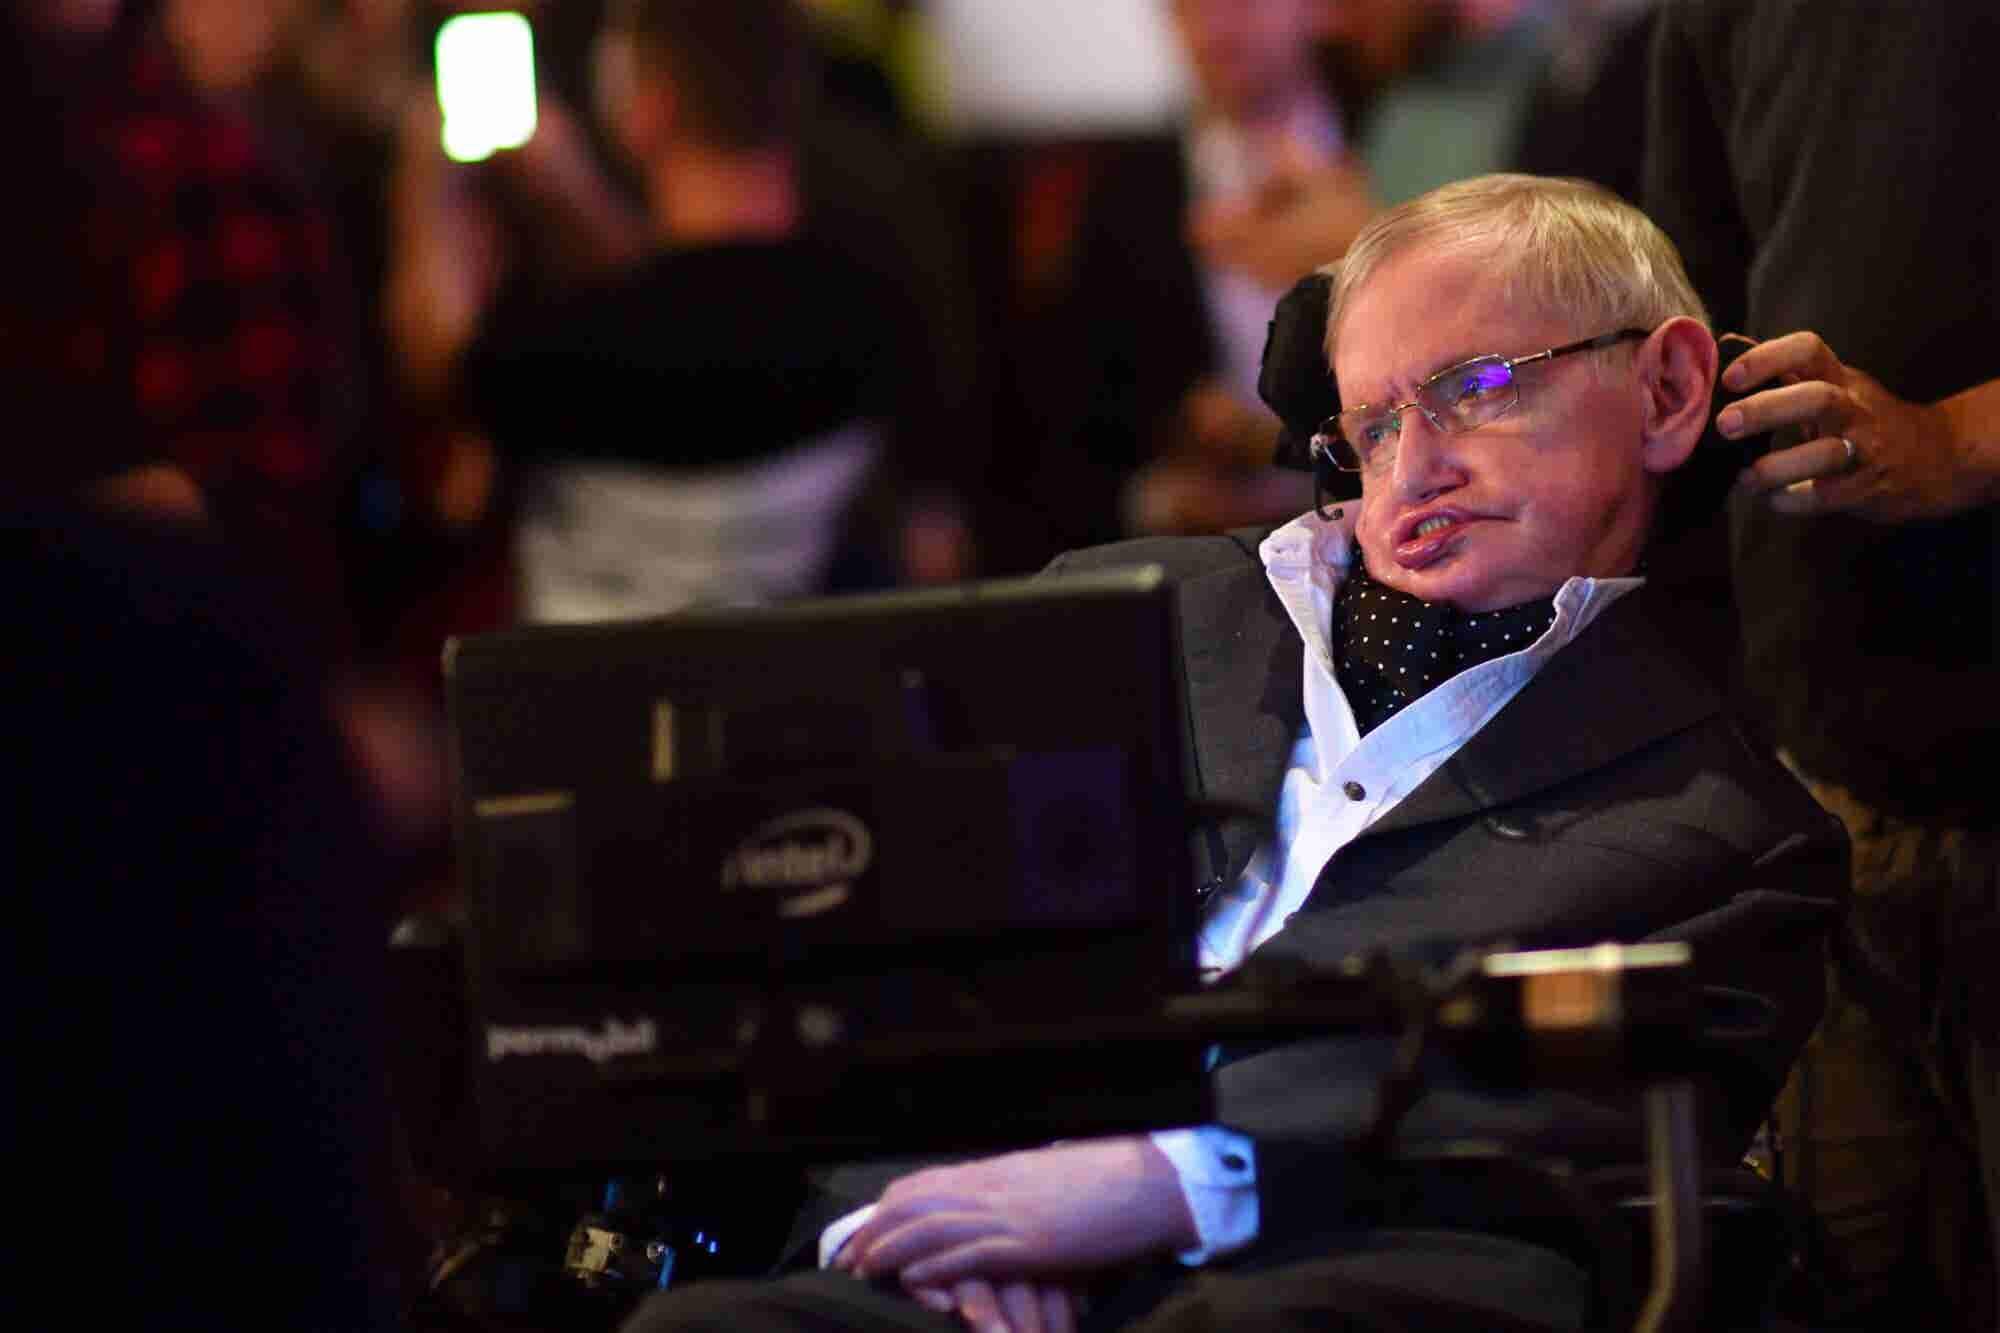 Stephen Hawking's Final Paper on Black Holes Is Now Online